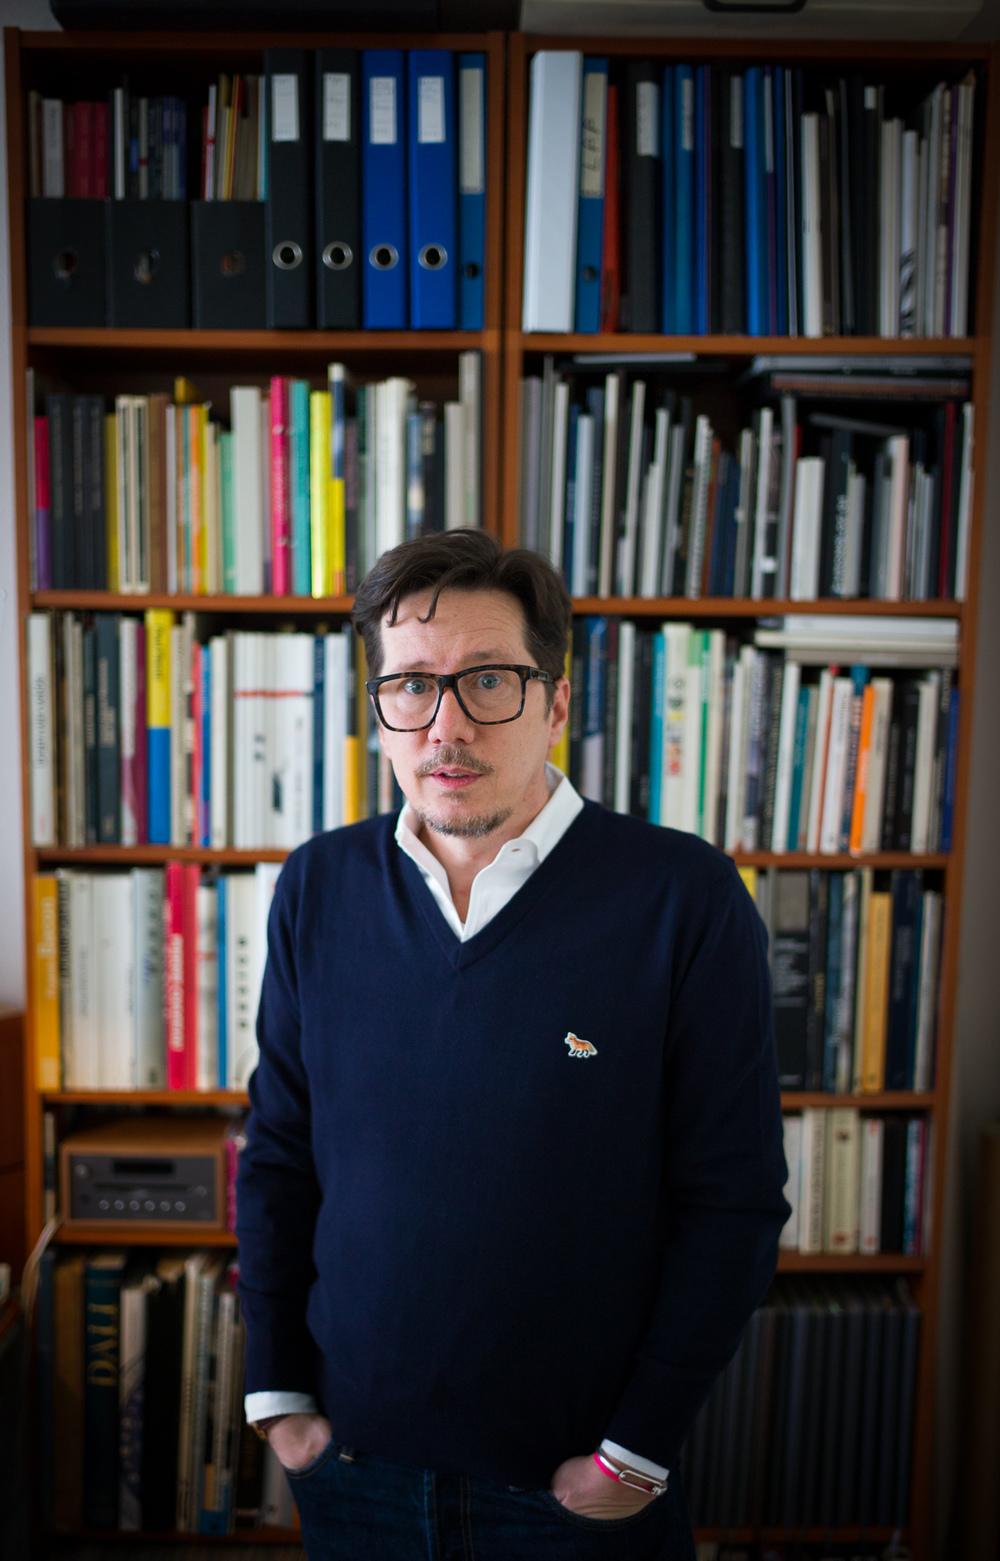 Eric Giroud, photographed inside his home, Geneva, Switzerland